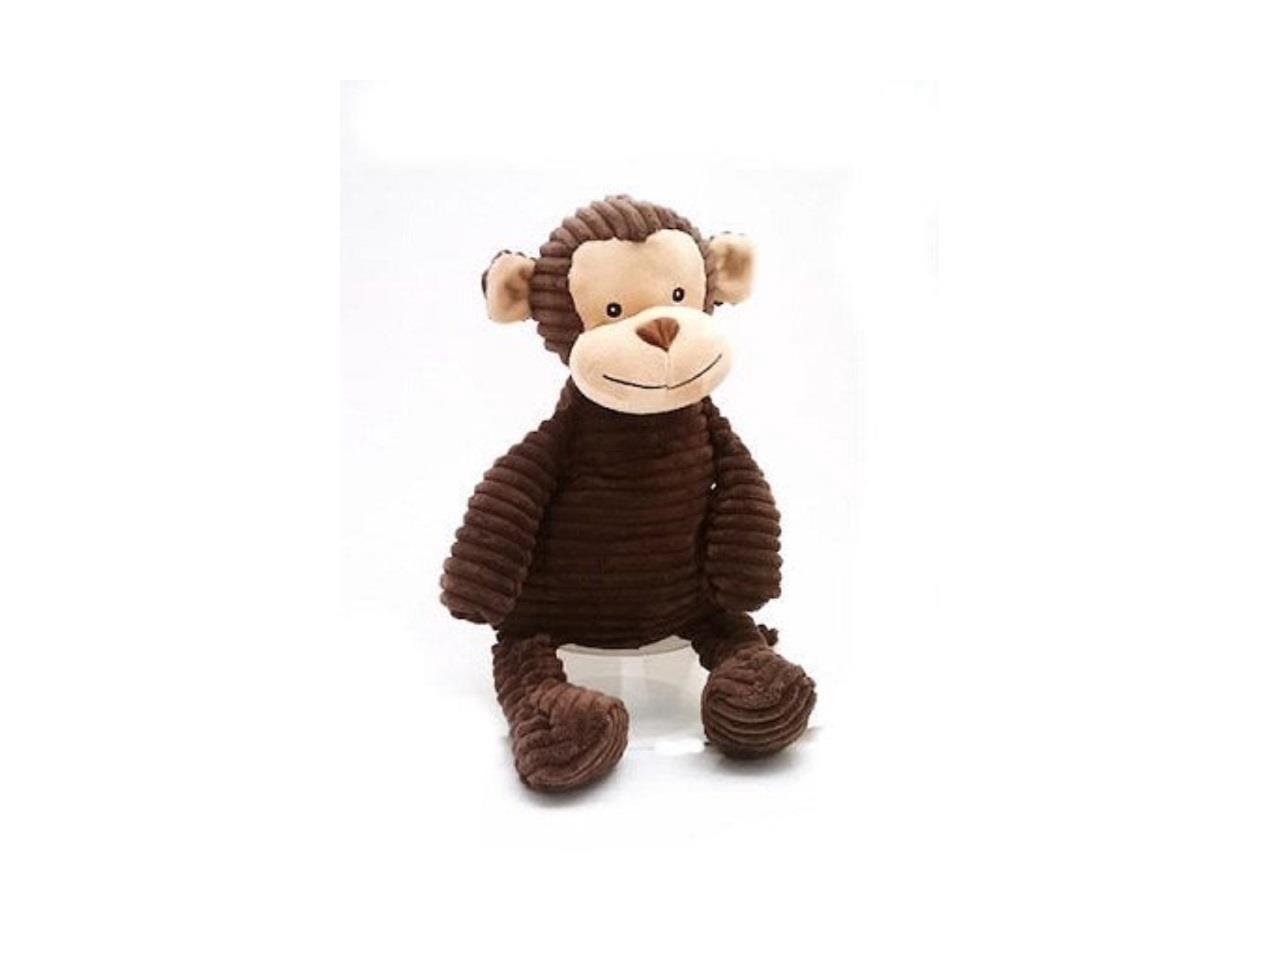 Teddy Bear Stuffed Toy, Kordy Monkey 18 By Unipak Newegg Com